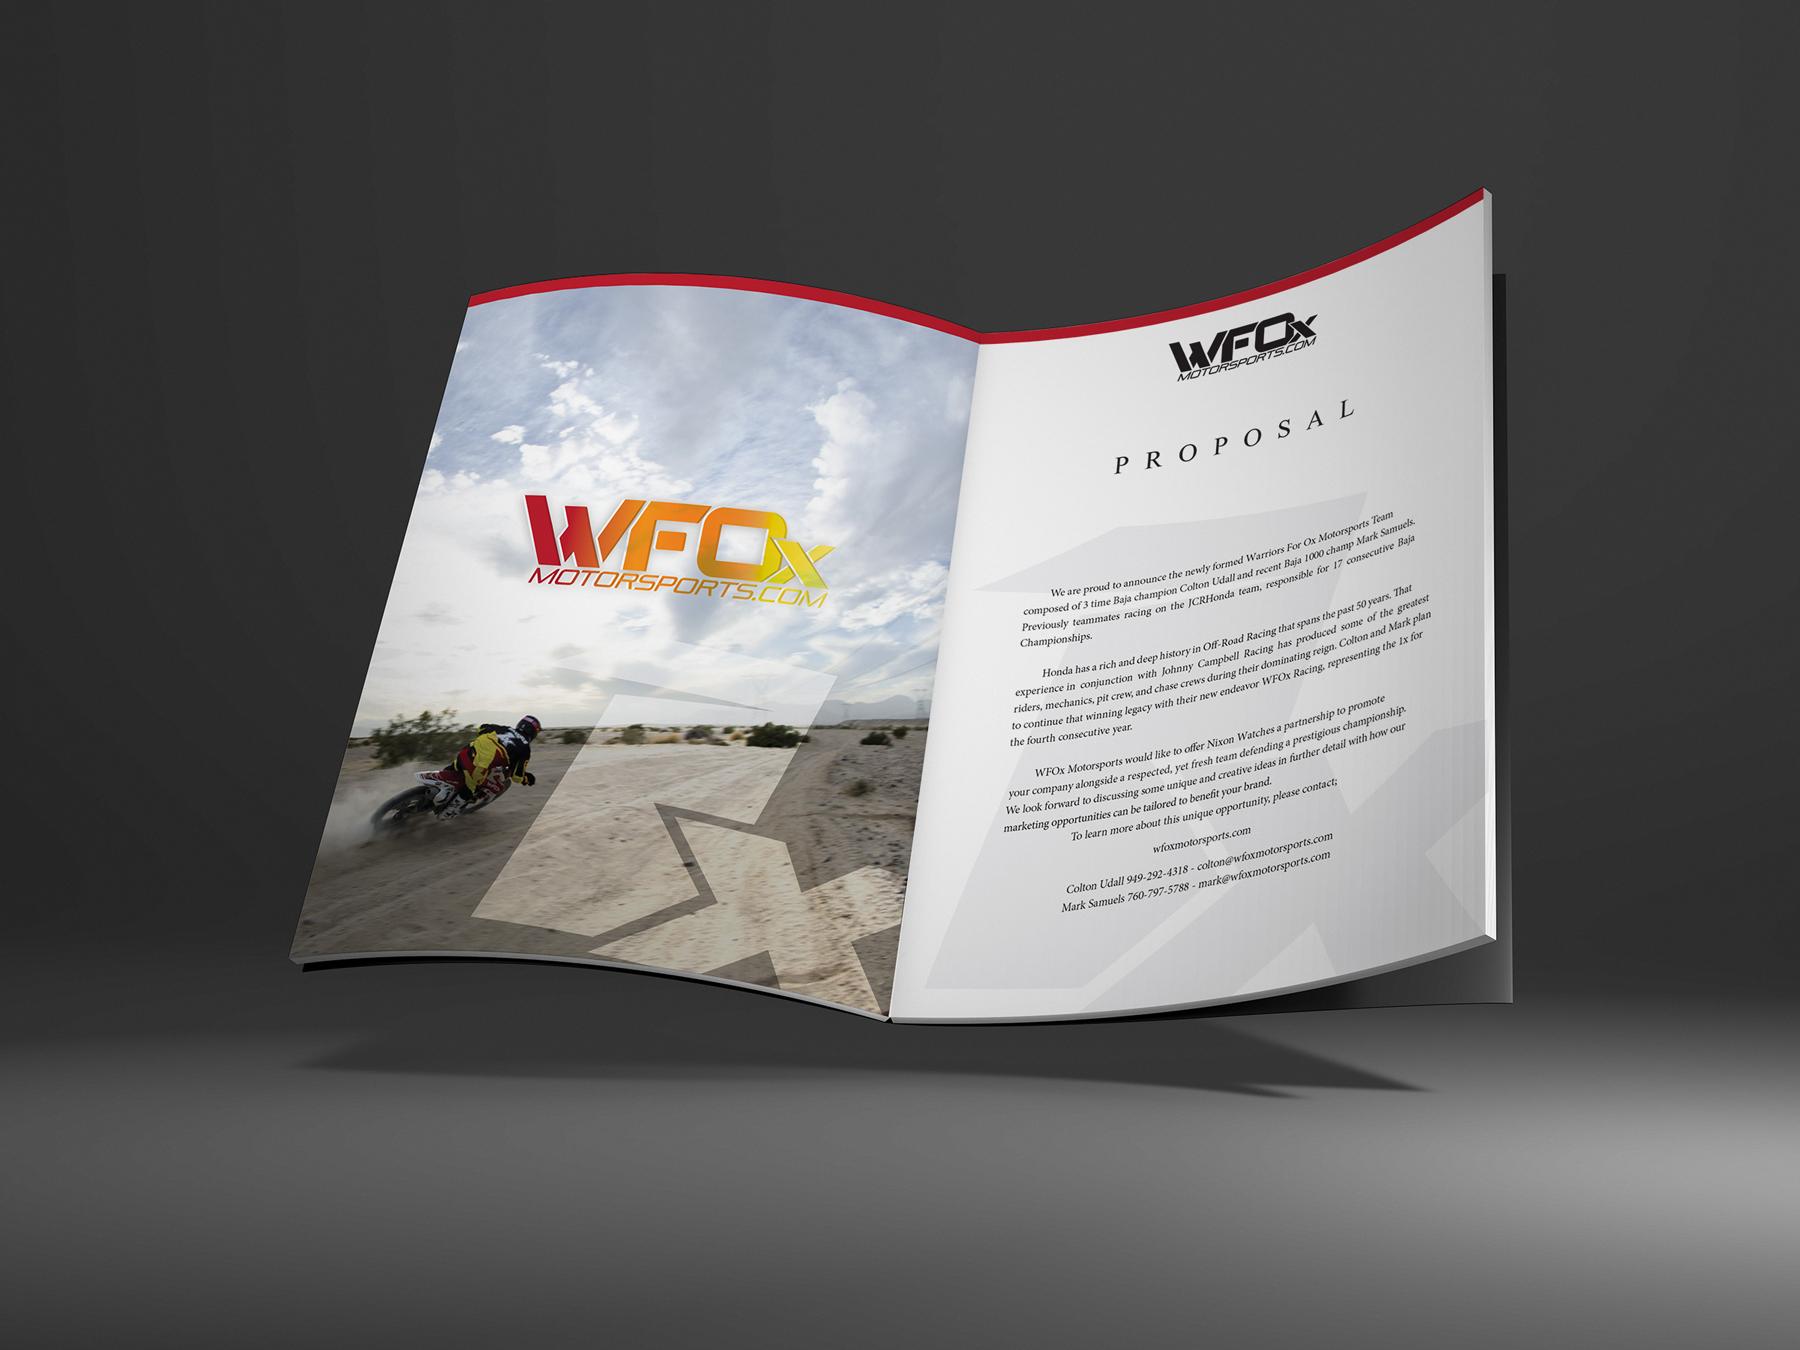 WfoxProposal-MediaKit.jpg